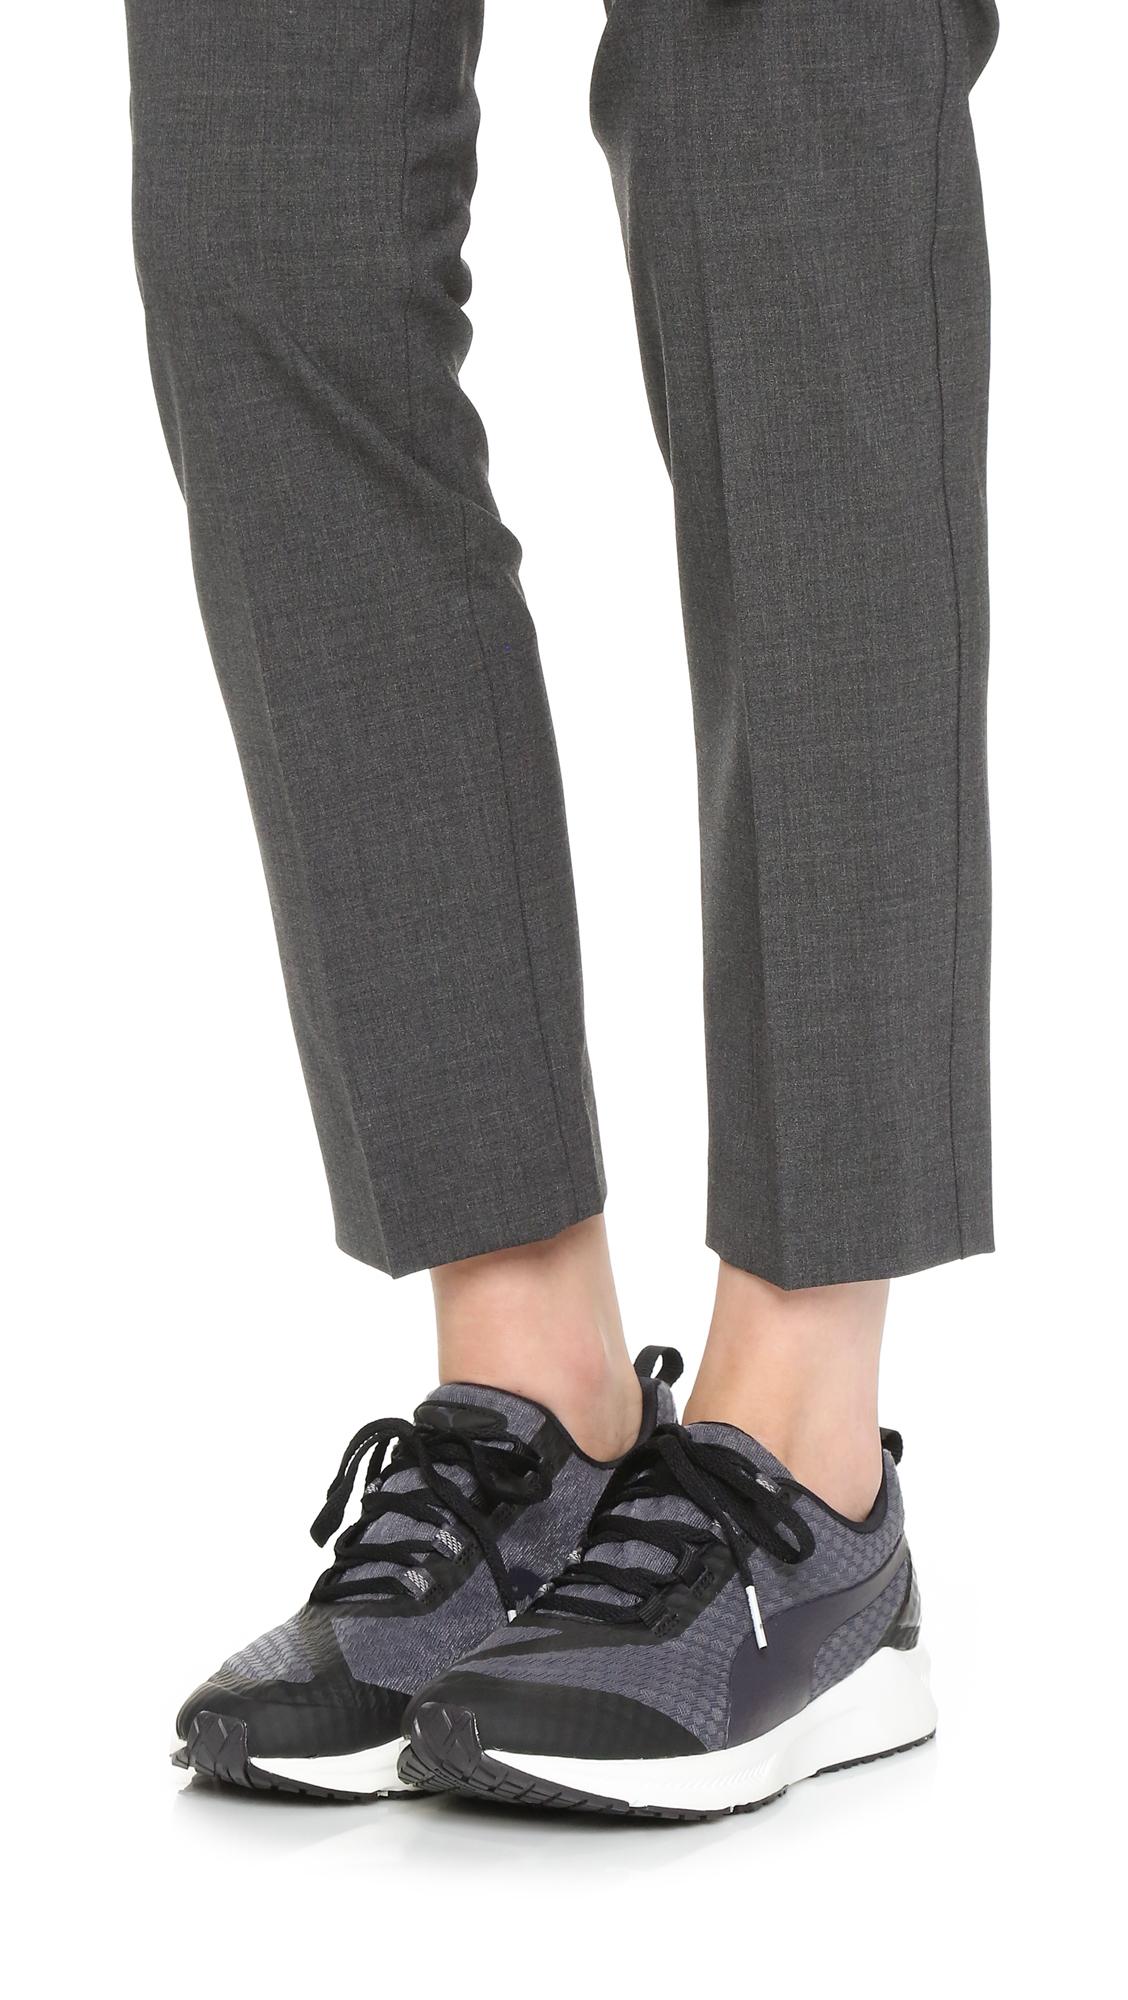 Puma Ignite Xt Core Sneakers in Black   Lyst